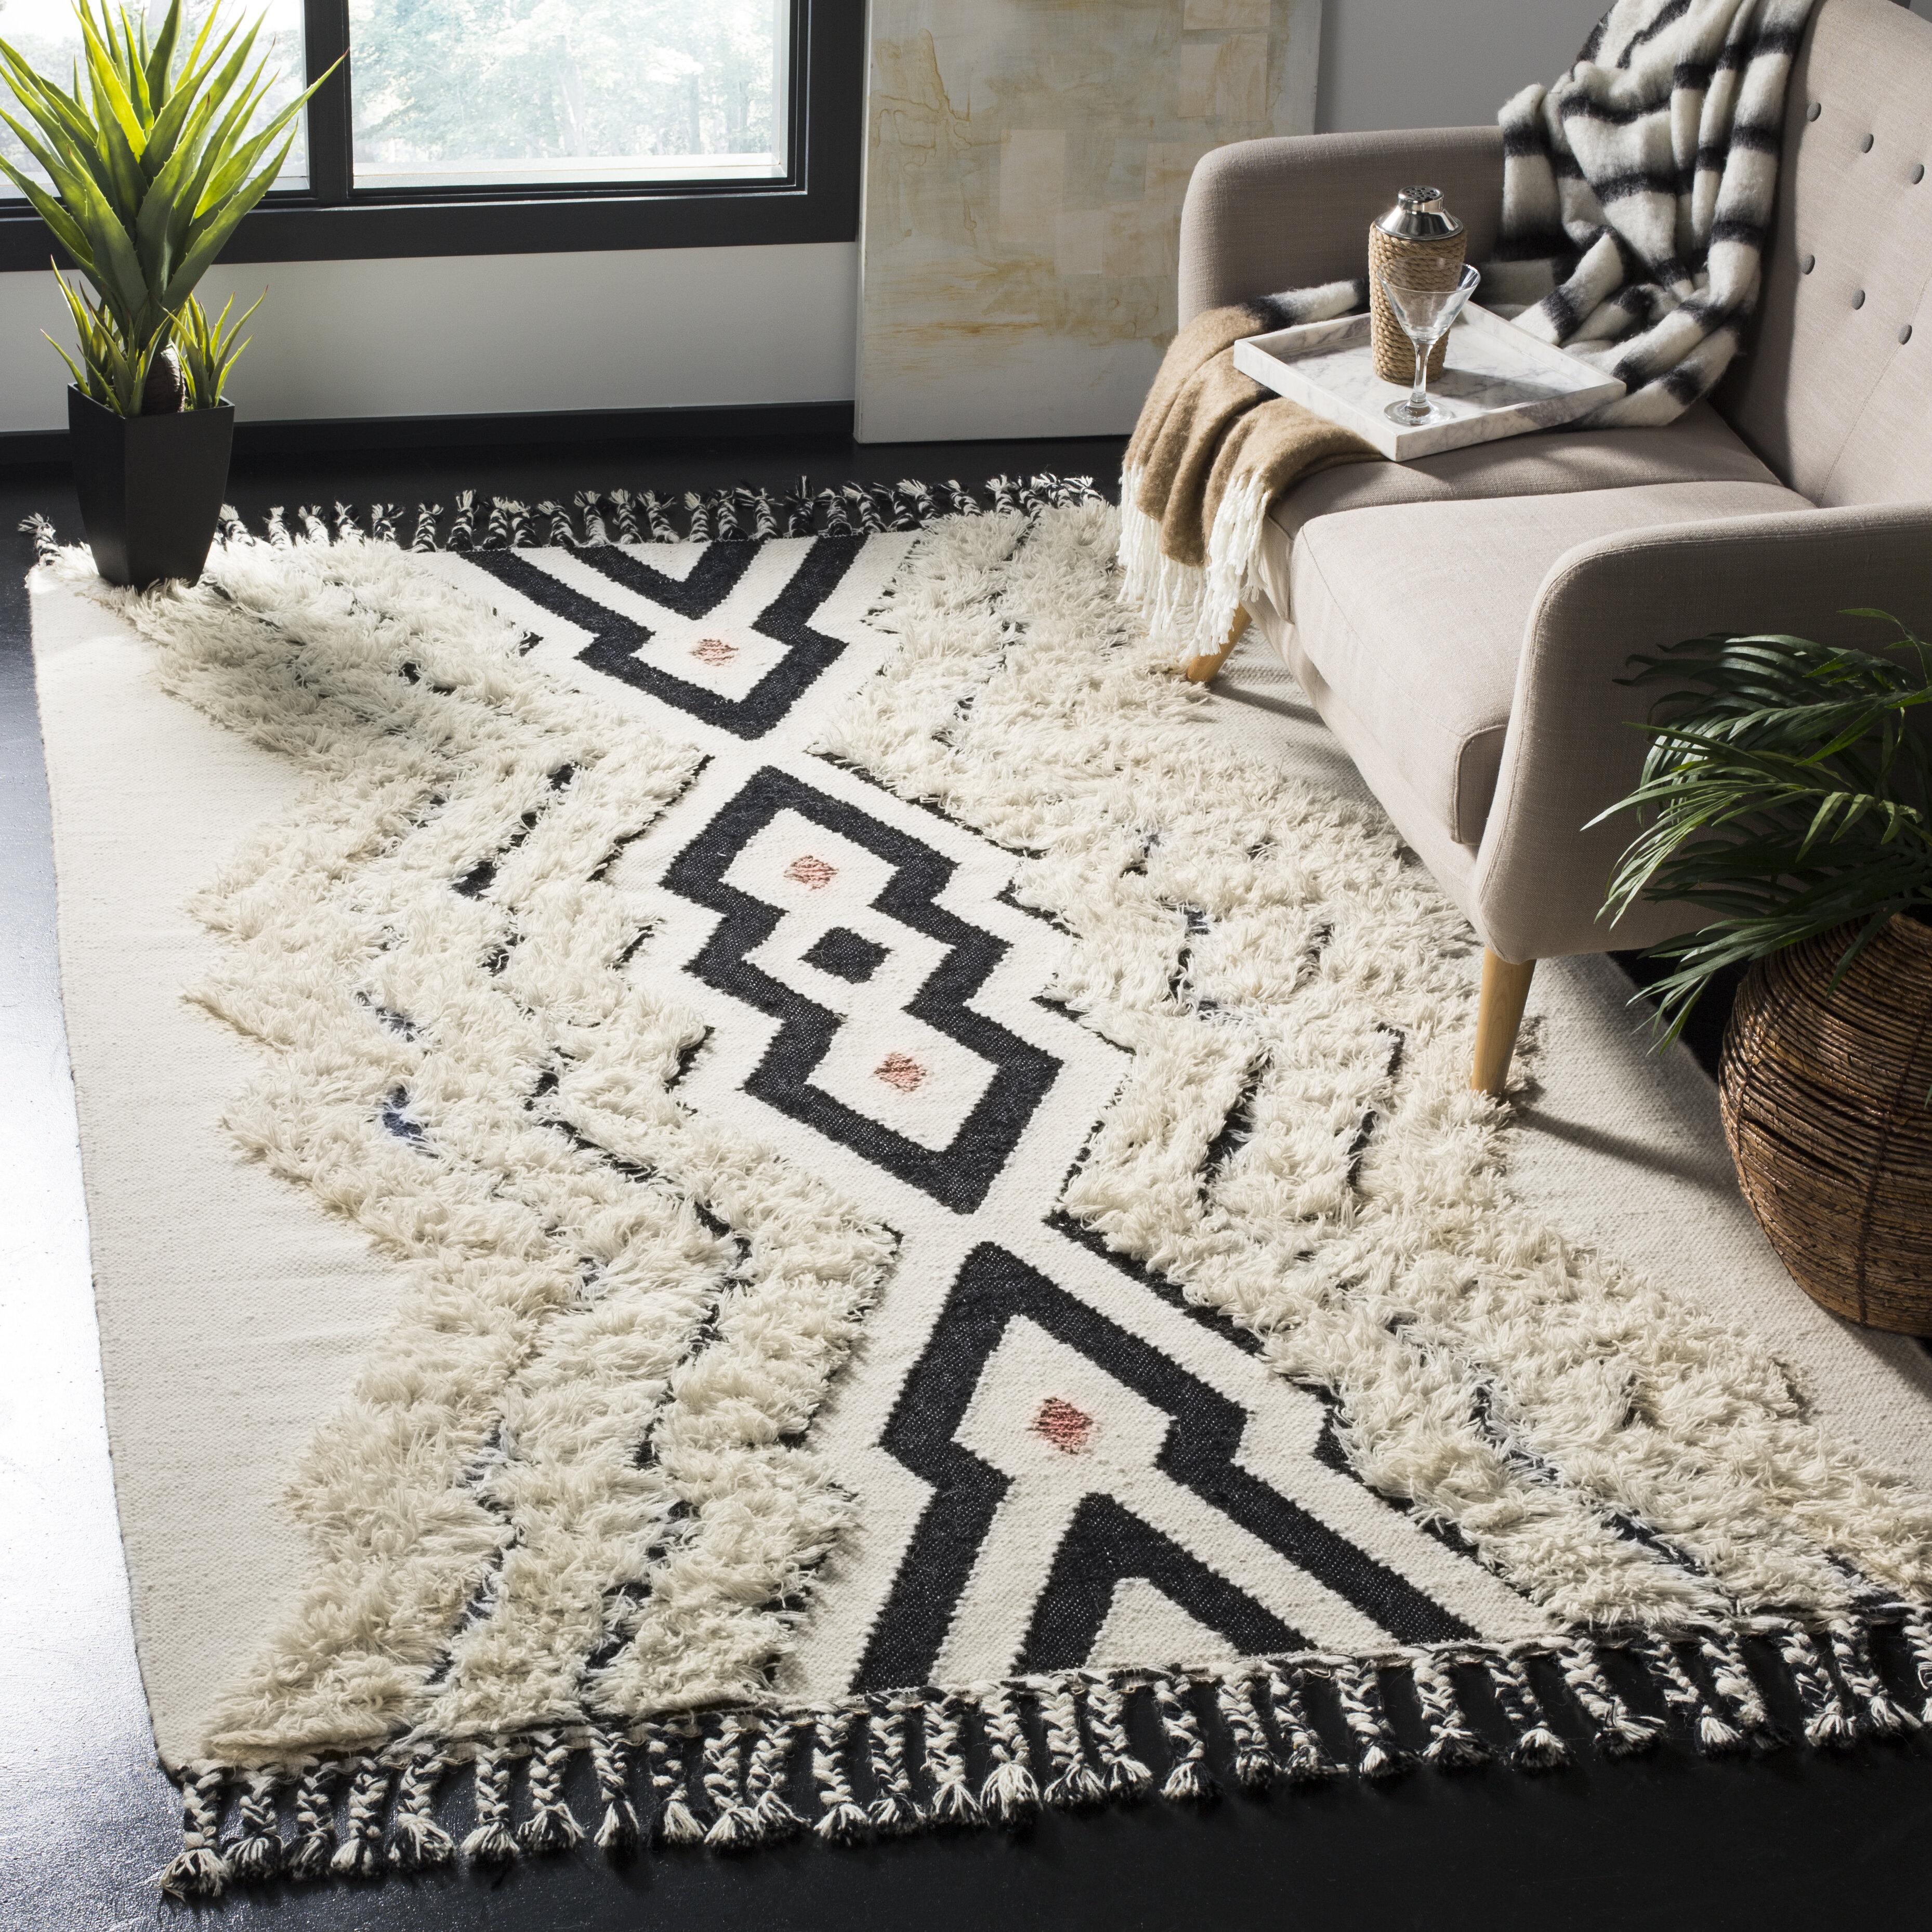 Black Wool Kitchen Rugs You Ll Love In 2021 Wayfair